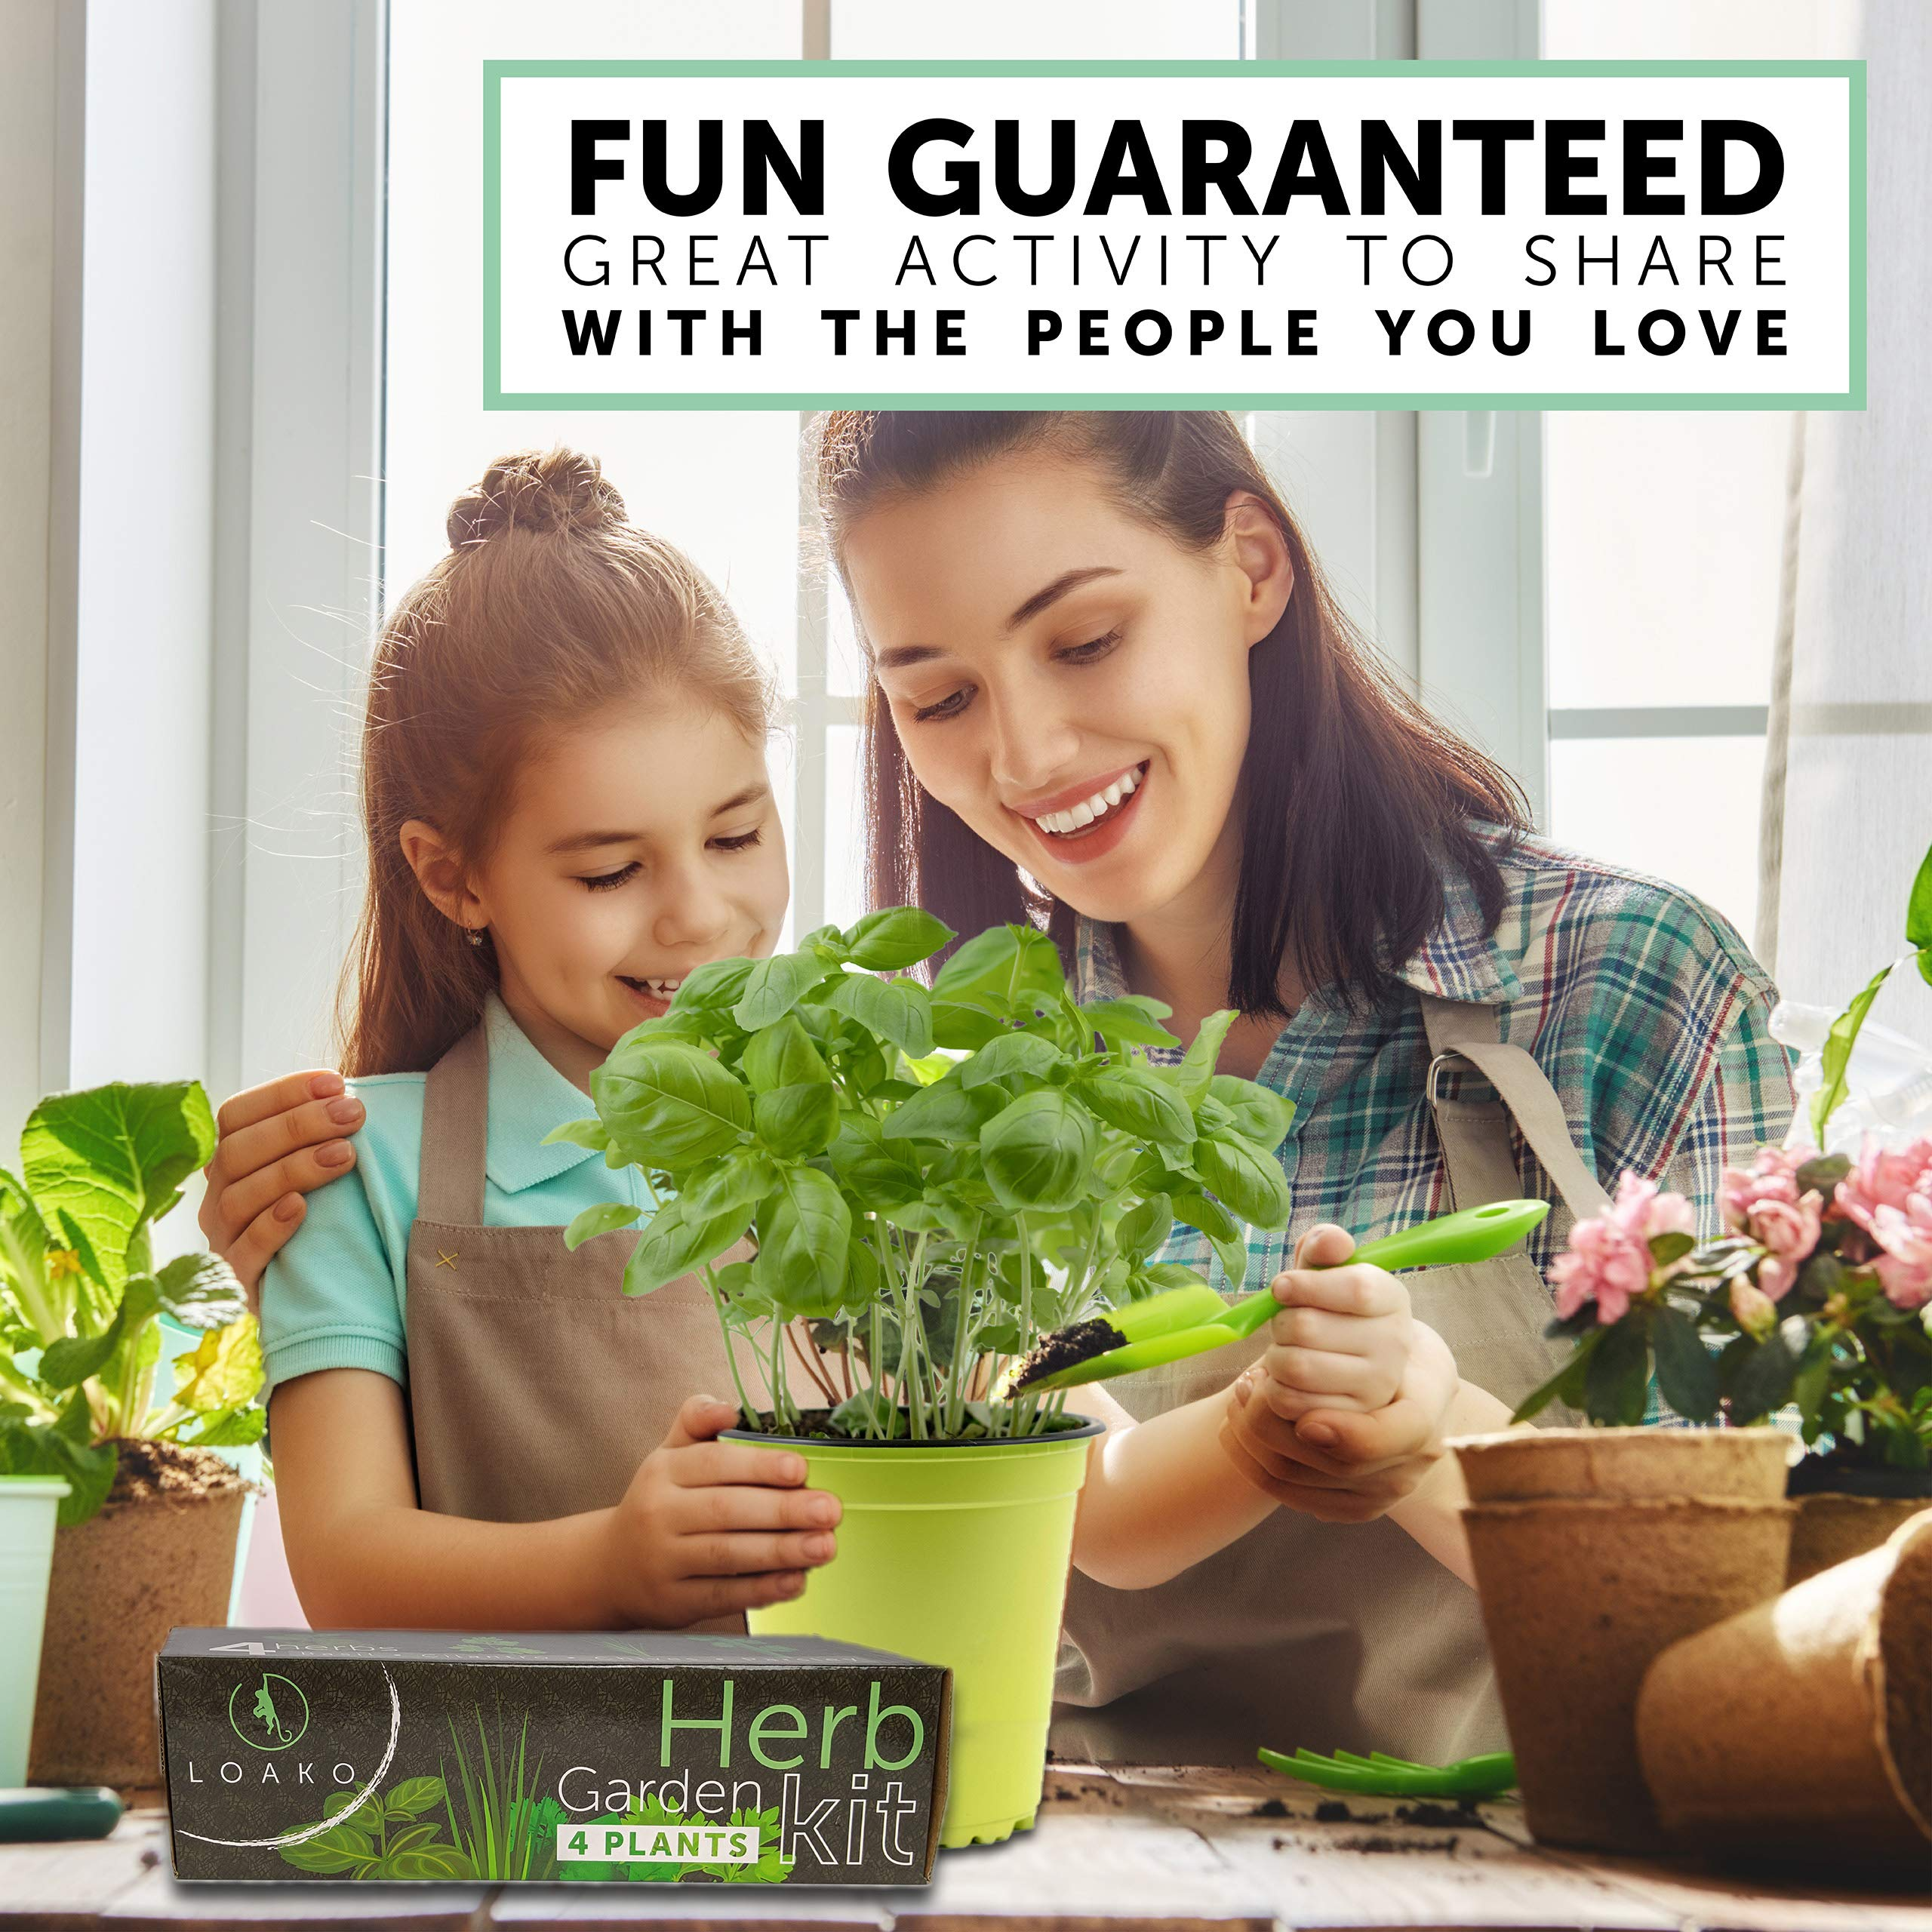 Indoor Herb Garden Starter Kit - 4 Herb Seeds Growing Kit with Bamboo Planting Pots & Potting Soil - Non-GMO Gardening Kit - DIY Home Seed Starter Grow Plant Kit - Basil, Parsley, Cilantro, Chives